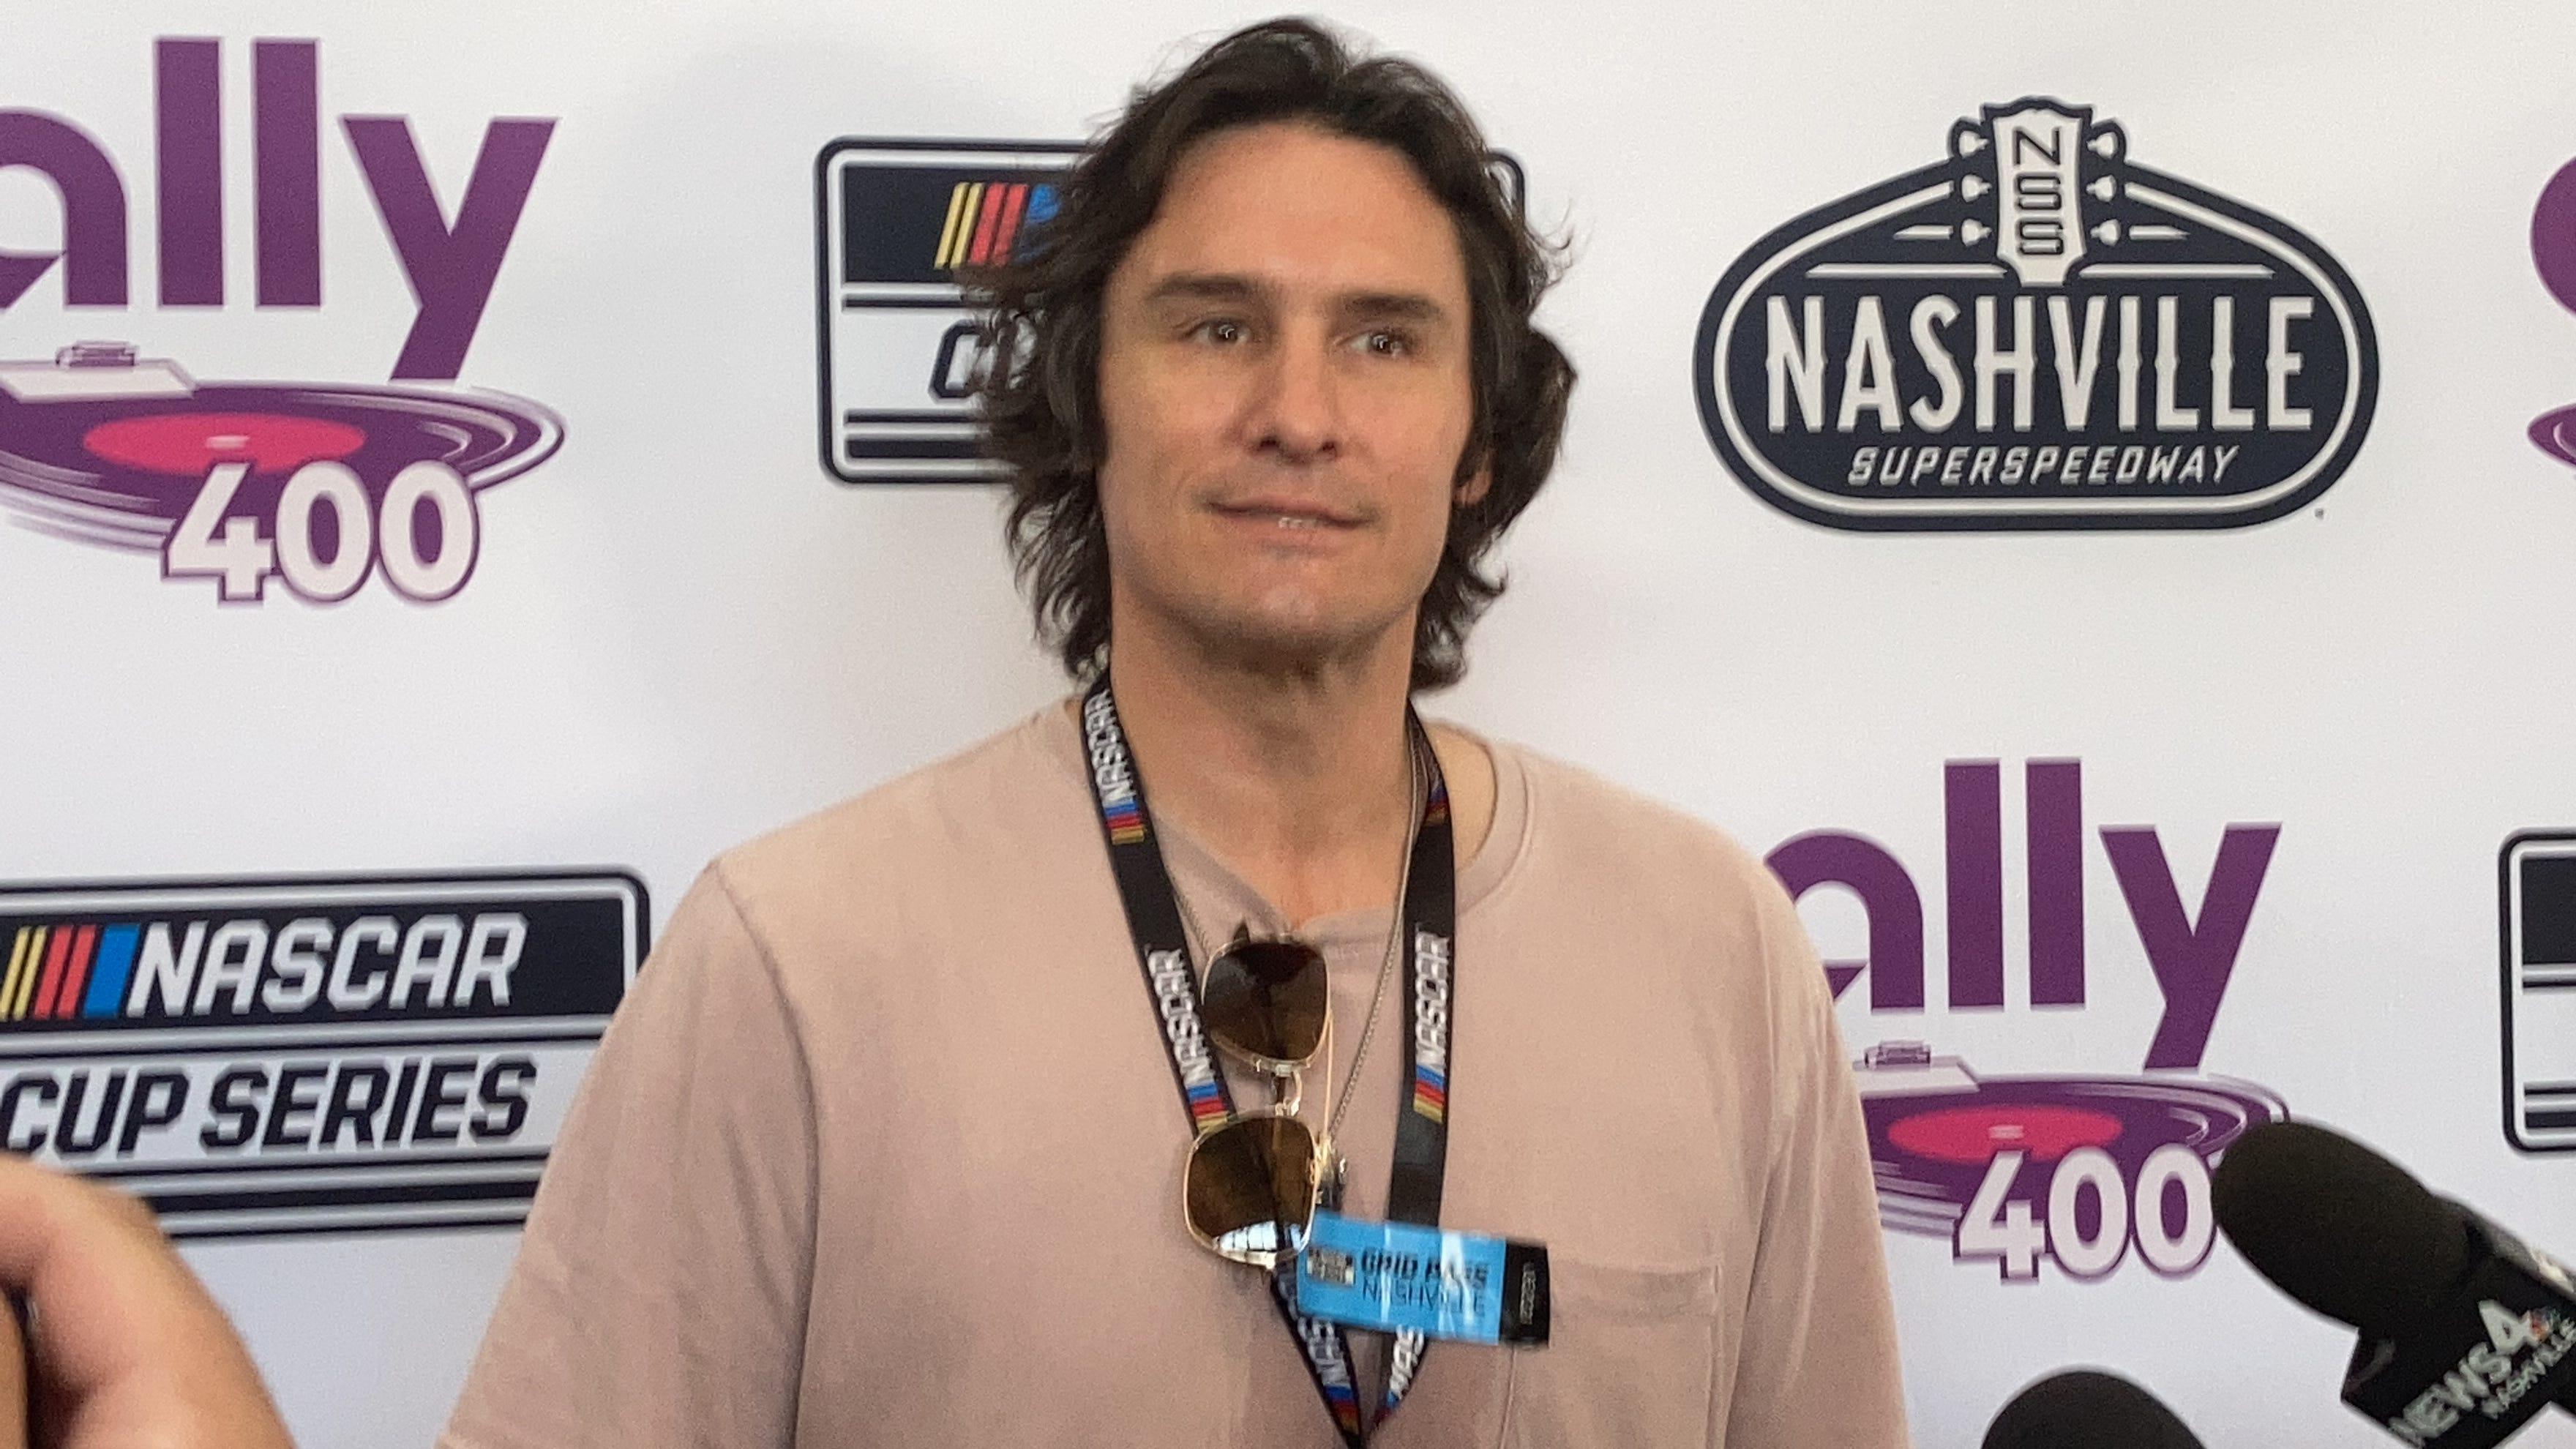 VIDEO: Country music singer Joe Nichols talks NASCAR being back in Nashville, sponsoring a car